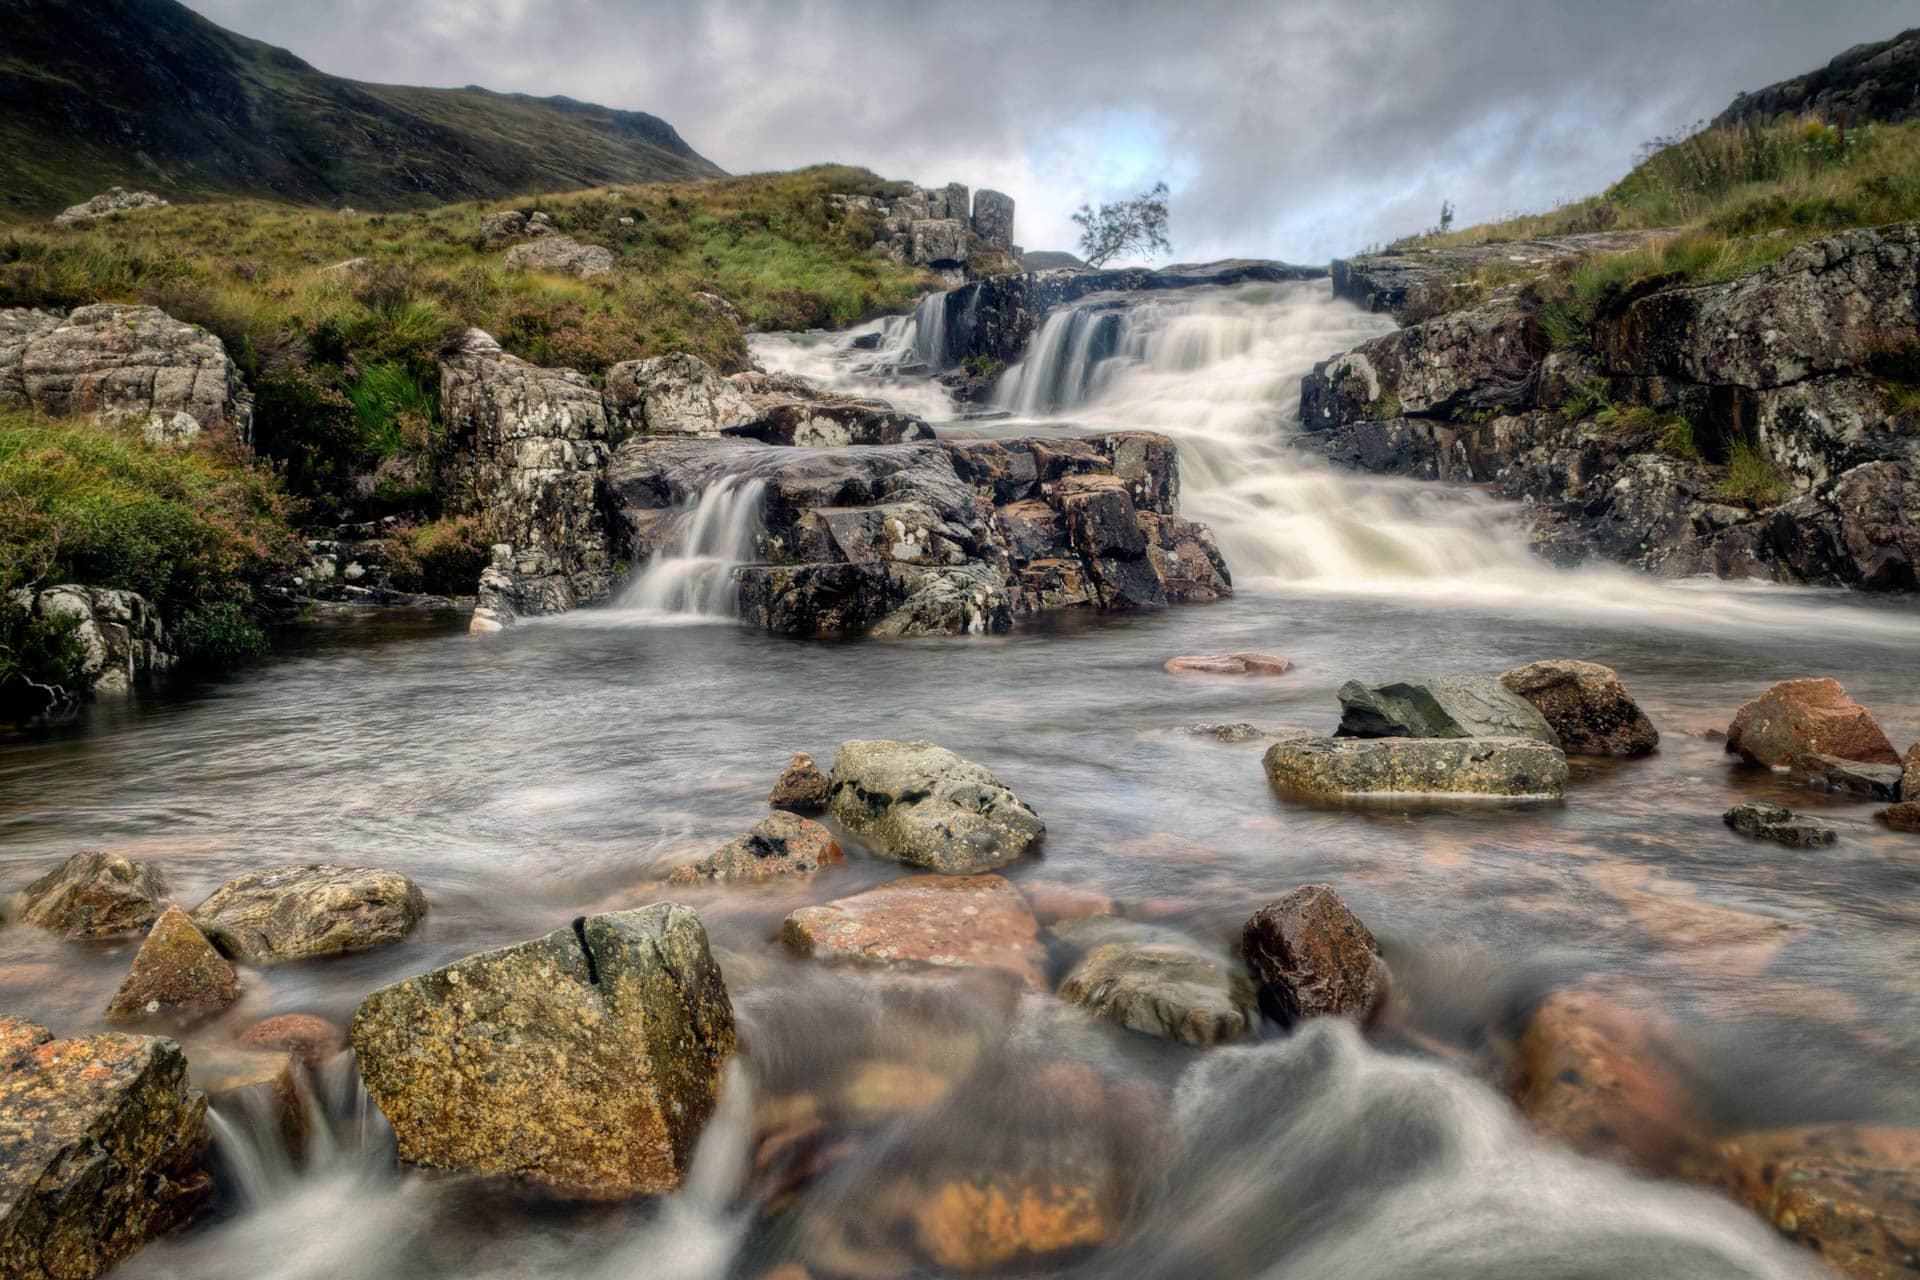 A stream tumbles down the mountainous hillside across rustic rock in Glen Coe, Glasgow.